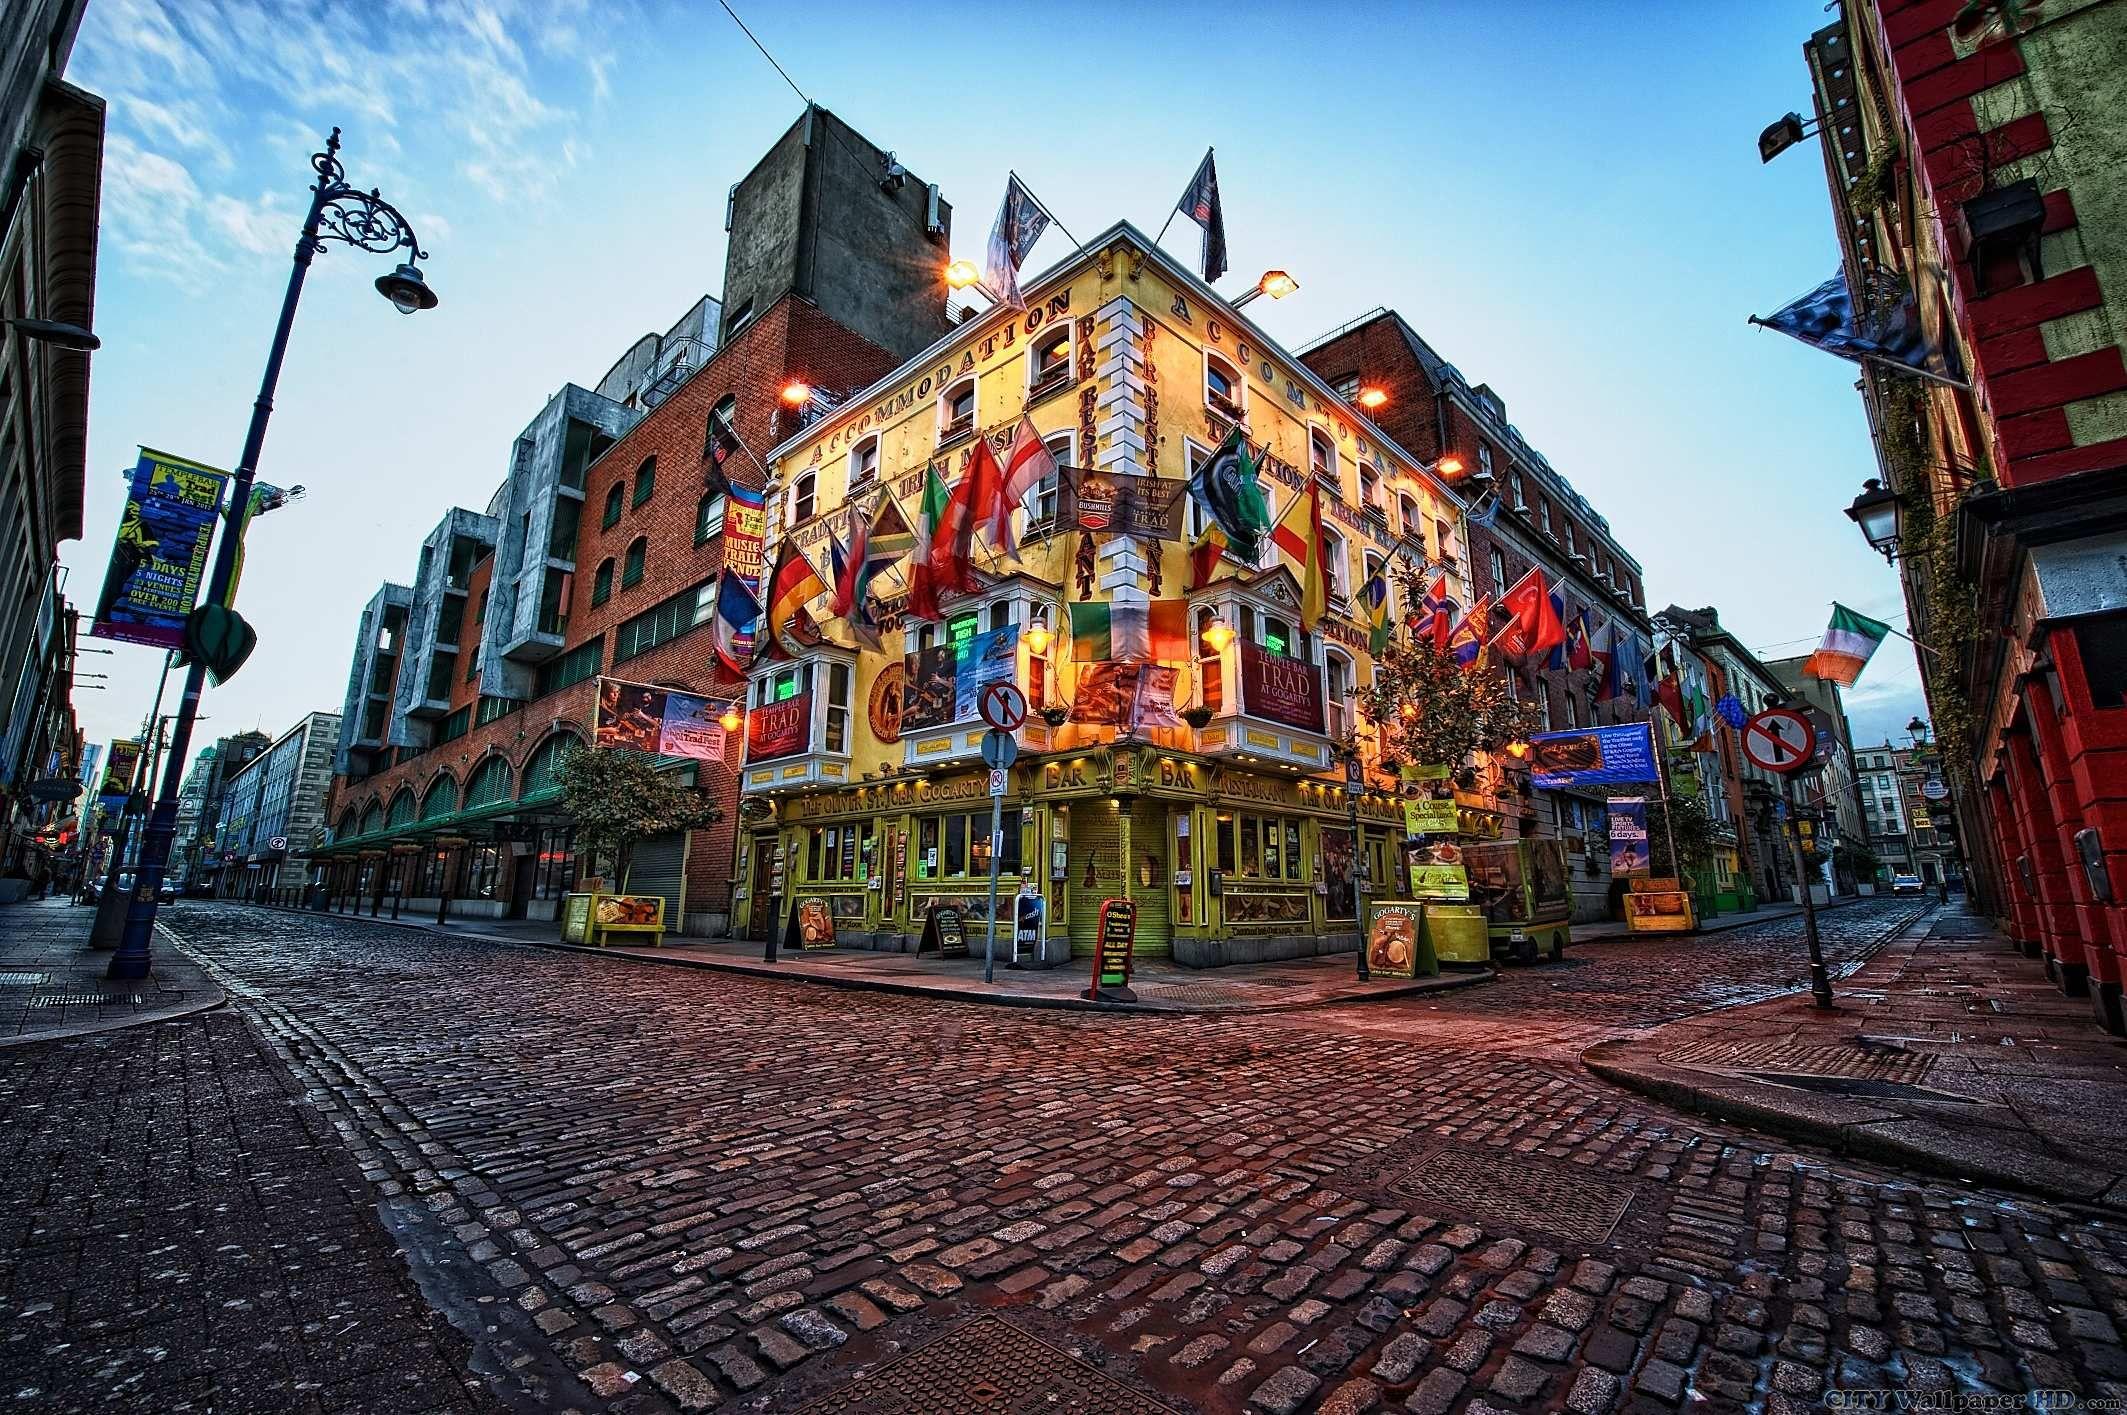 St Patrick S Day Irish Pub Crawl In The Temple Bar District Delightful City Of Dublin Ireland